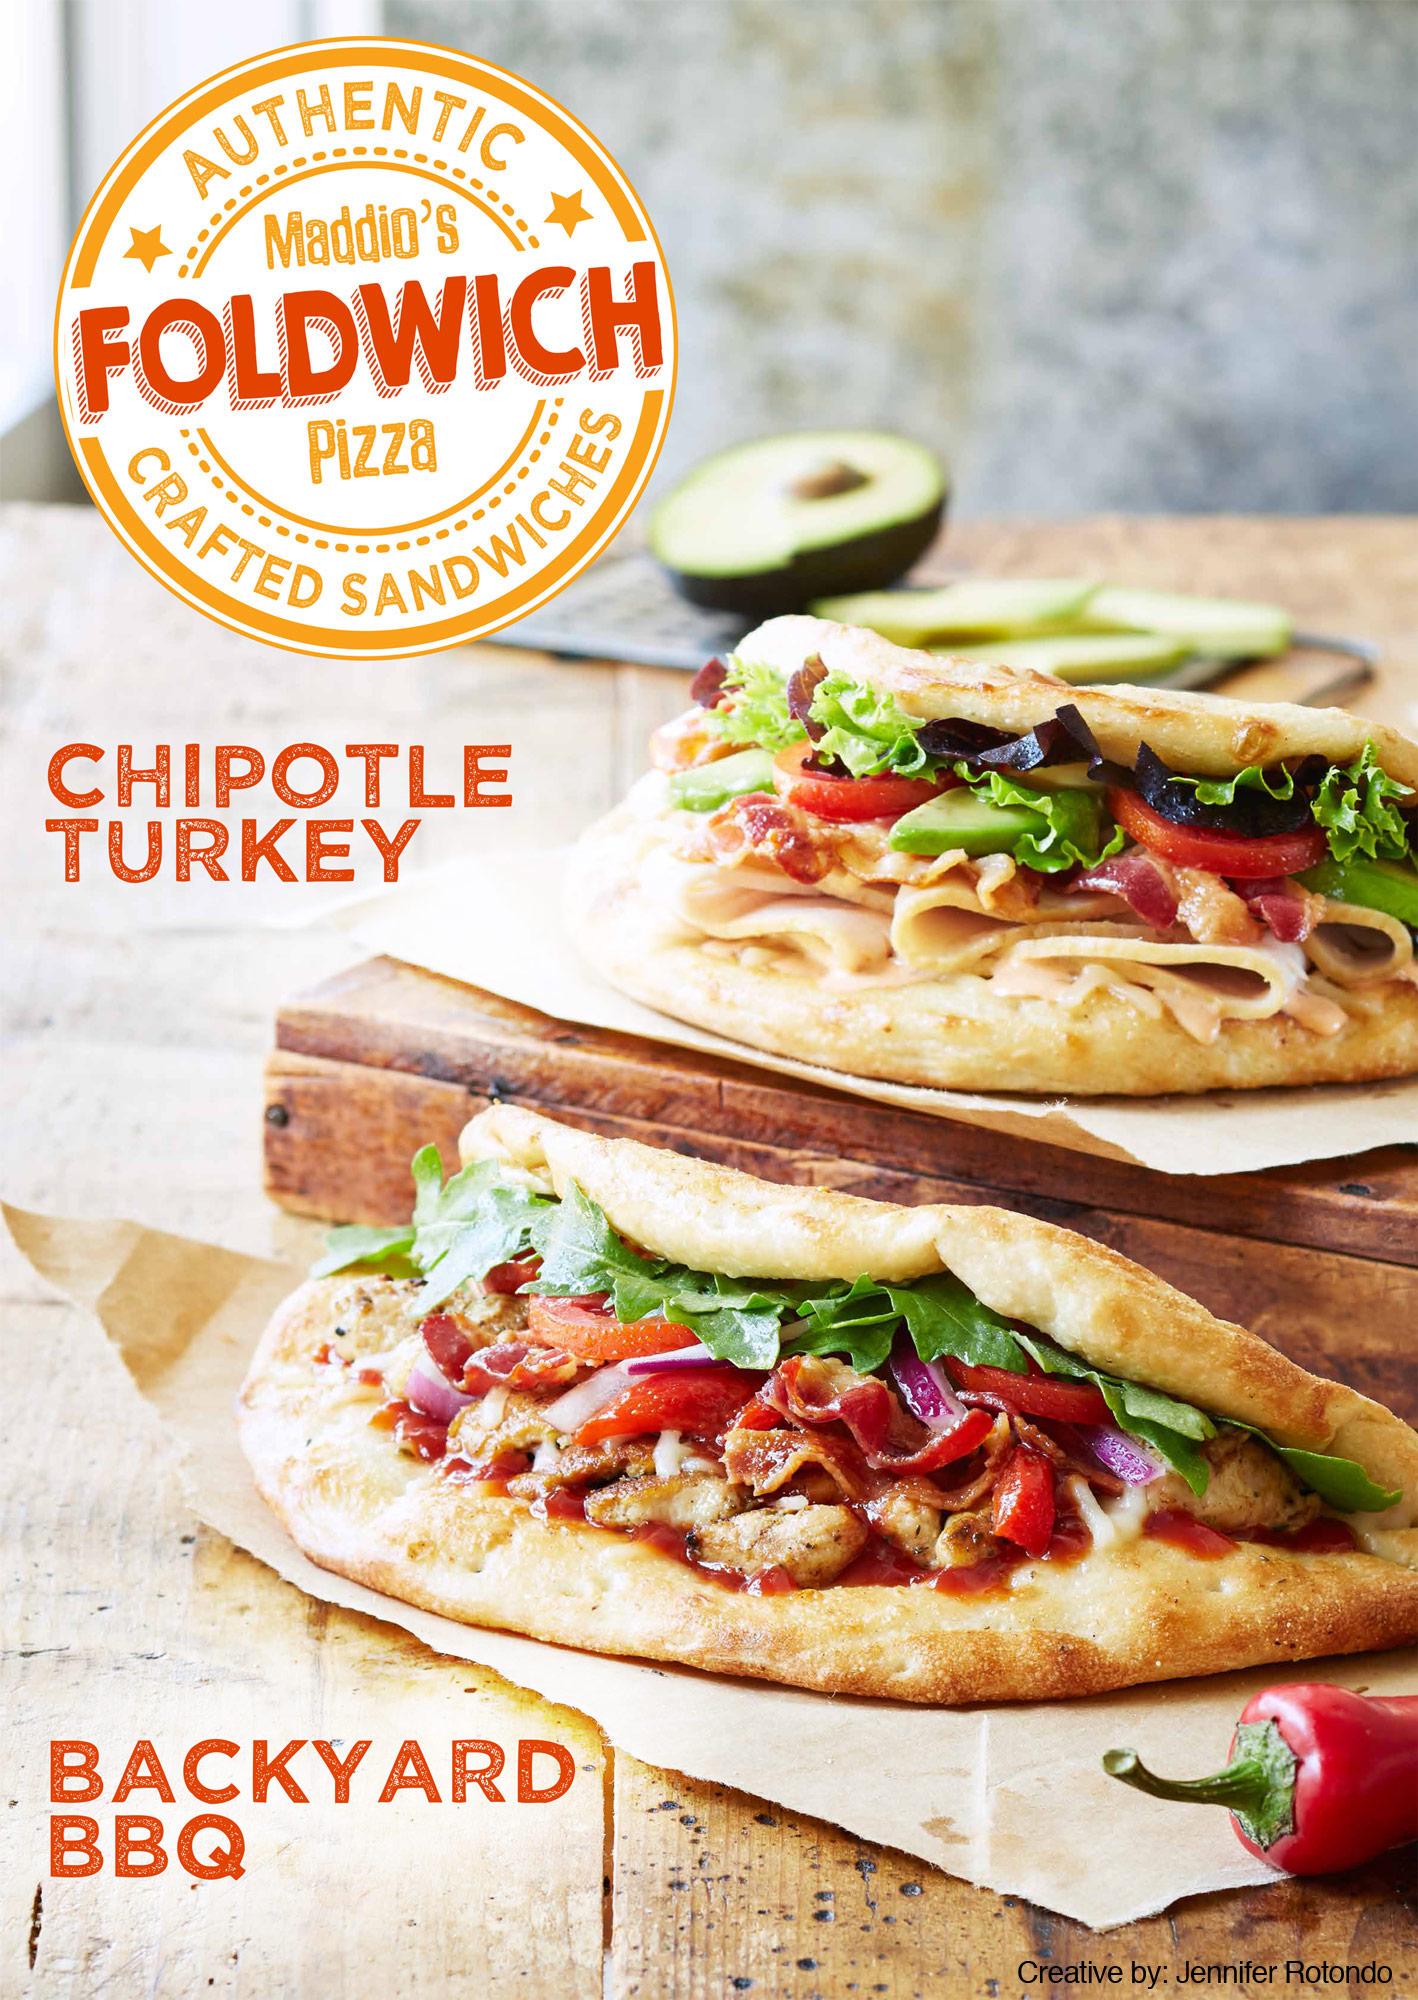 Uncle-Maddio's-Foldwich-ChipotleTurkey-BackyardBBQ